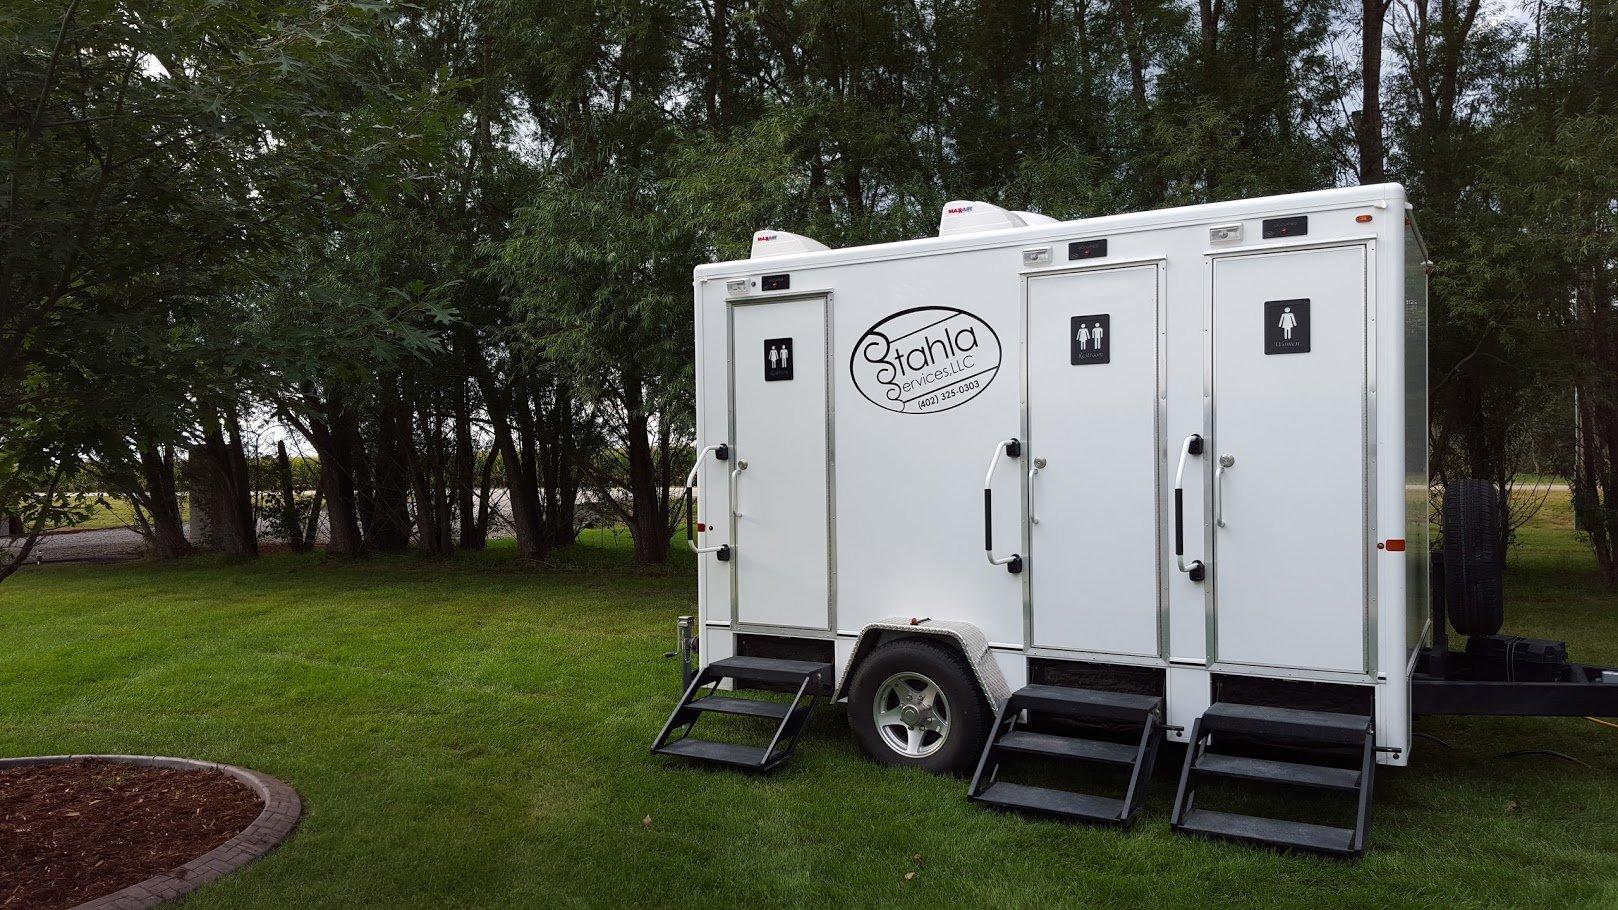 Shower and Restroom Trailer Rentals 4 Stall Restroom Lawn - Restroom Trailers